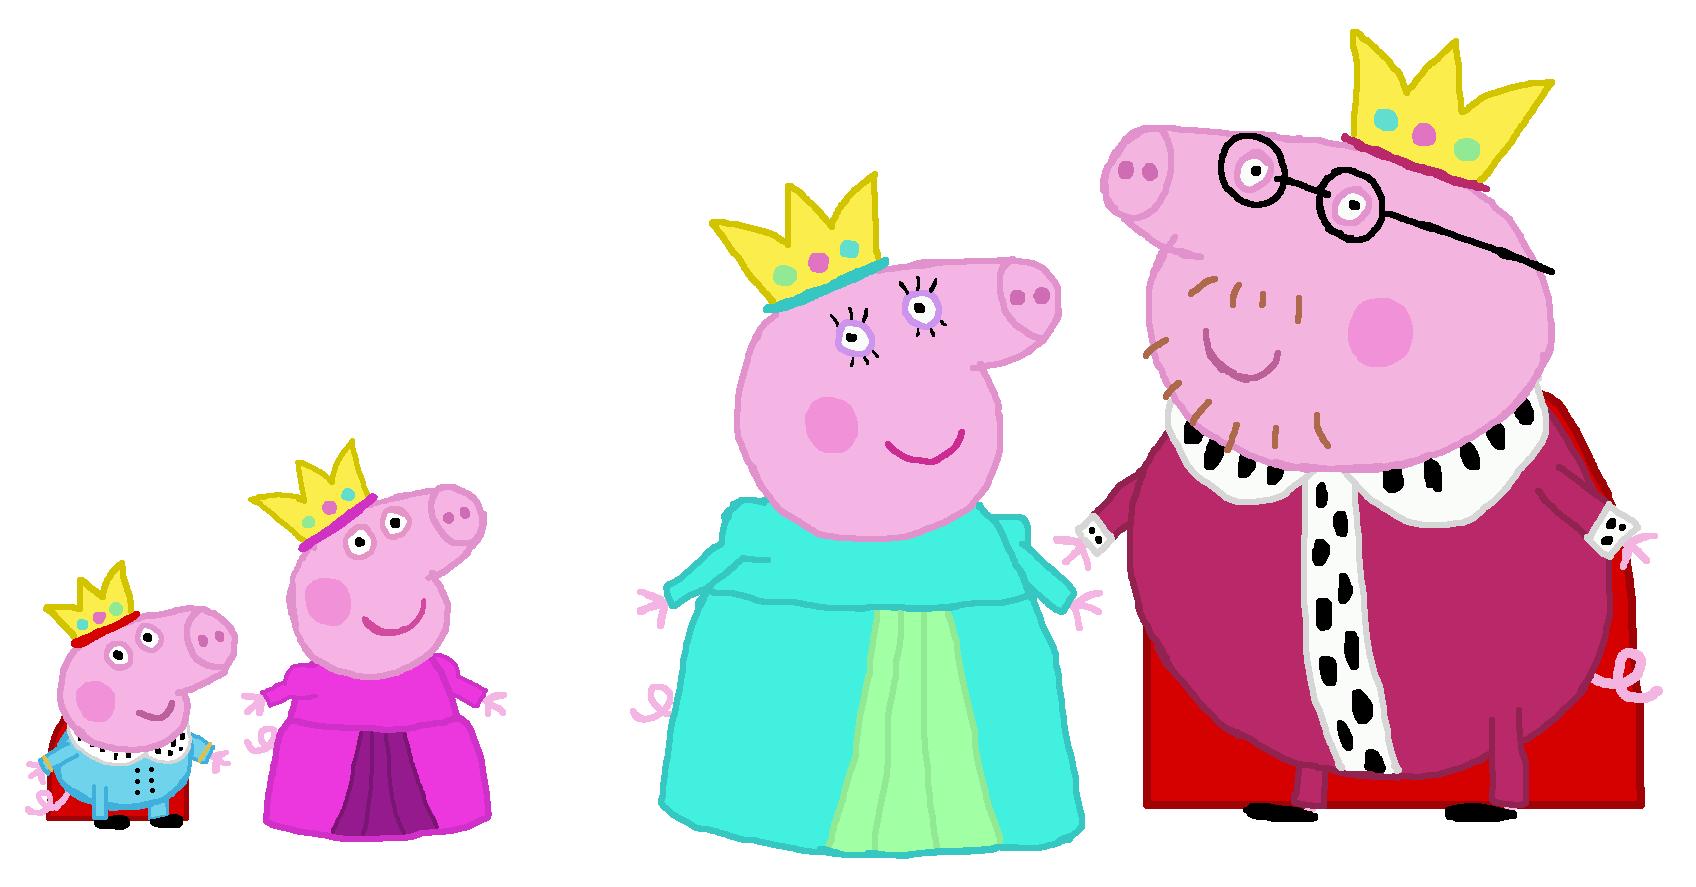 Peppa Pig images Royal family Peppa Pig HD wallpaper and